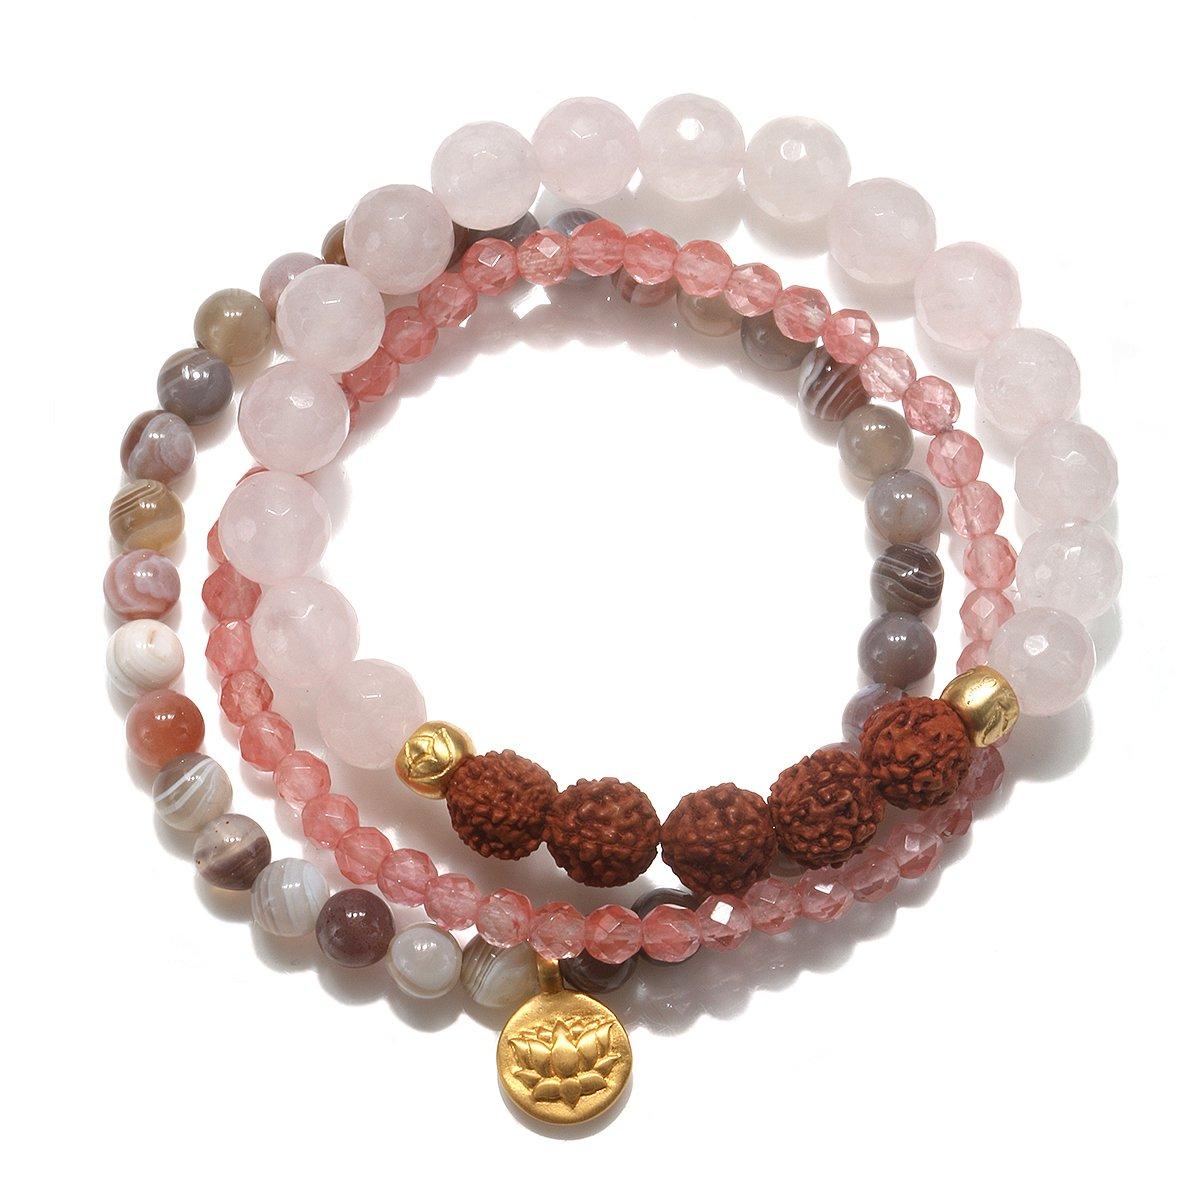 424c27b3c45ad Amazon.com: Satya Jewelry Womens Rose Quartz Gold Lotus Stretch ...